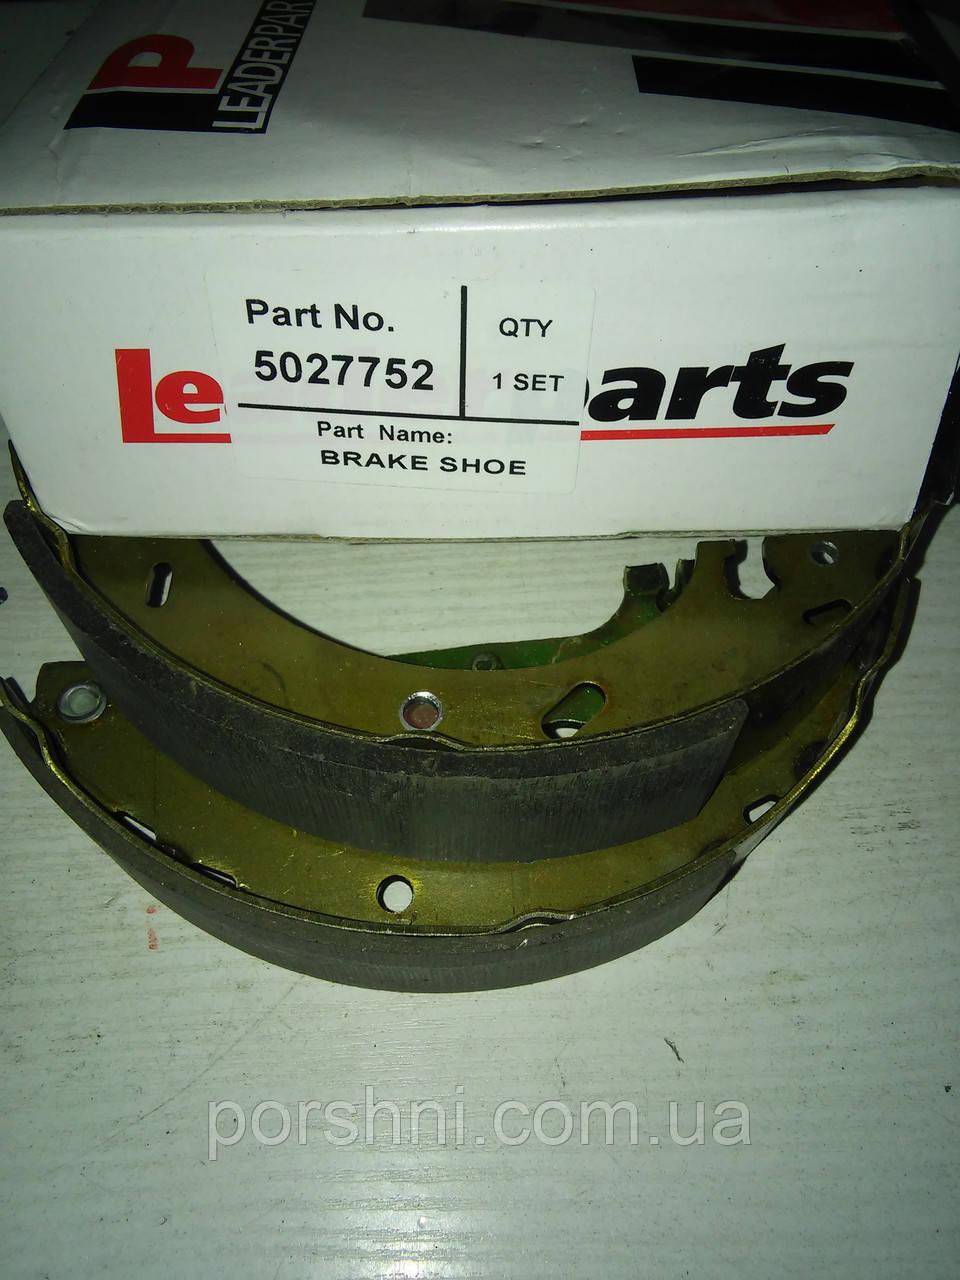 Колодки тормозные задние Ford  Моndeo 1,6  Ø 203 x 38  Leaderpar  5027752